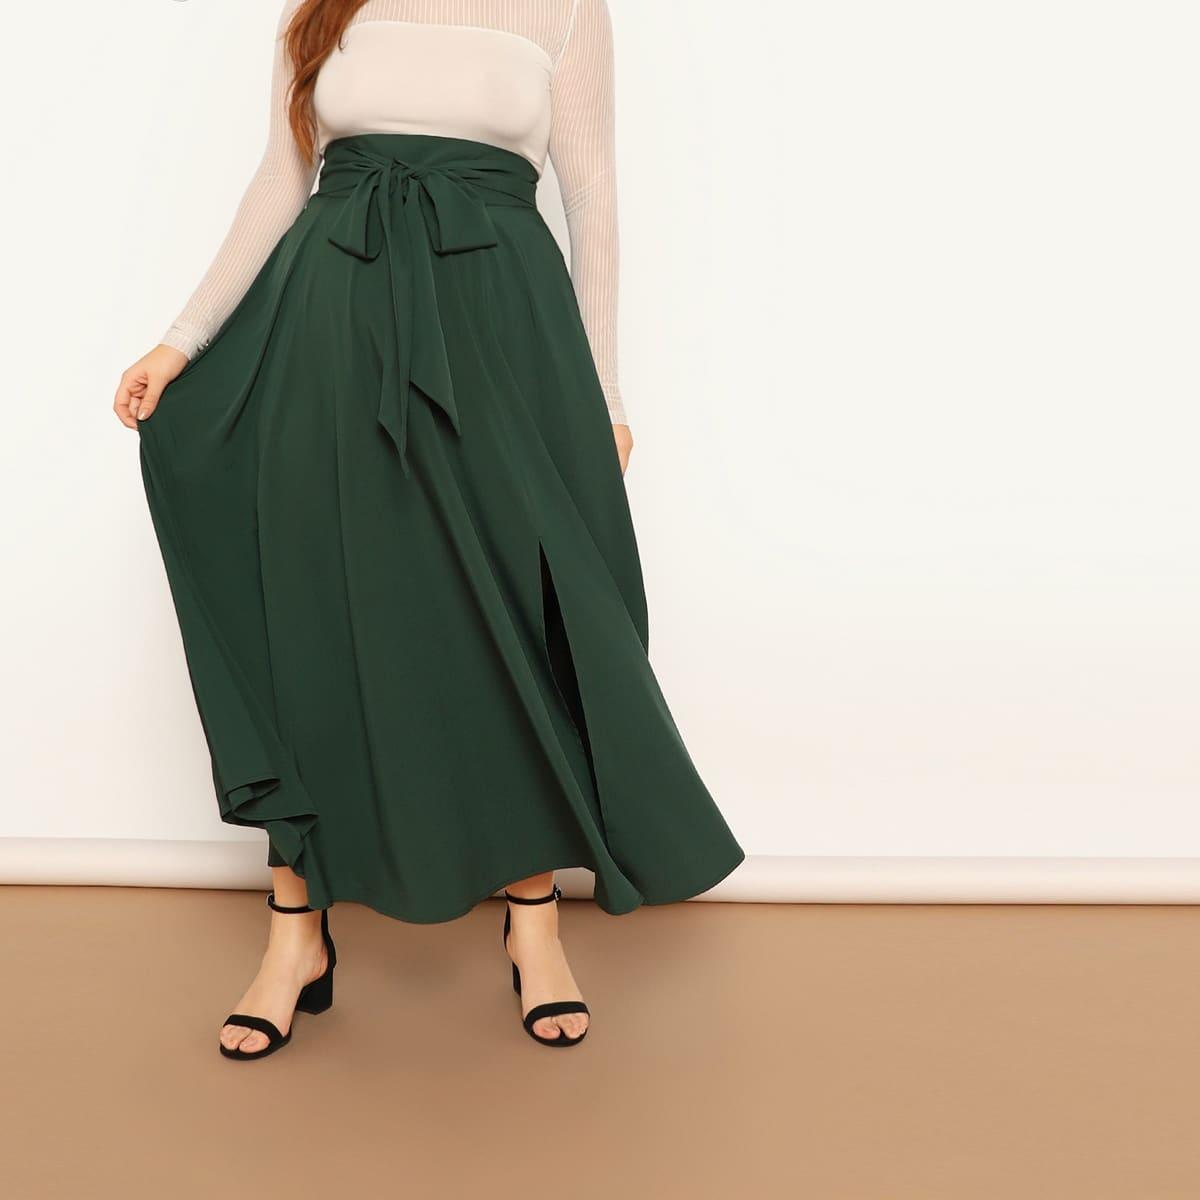 Размера плюс юбка на молнии сзади